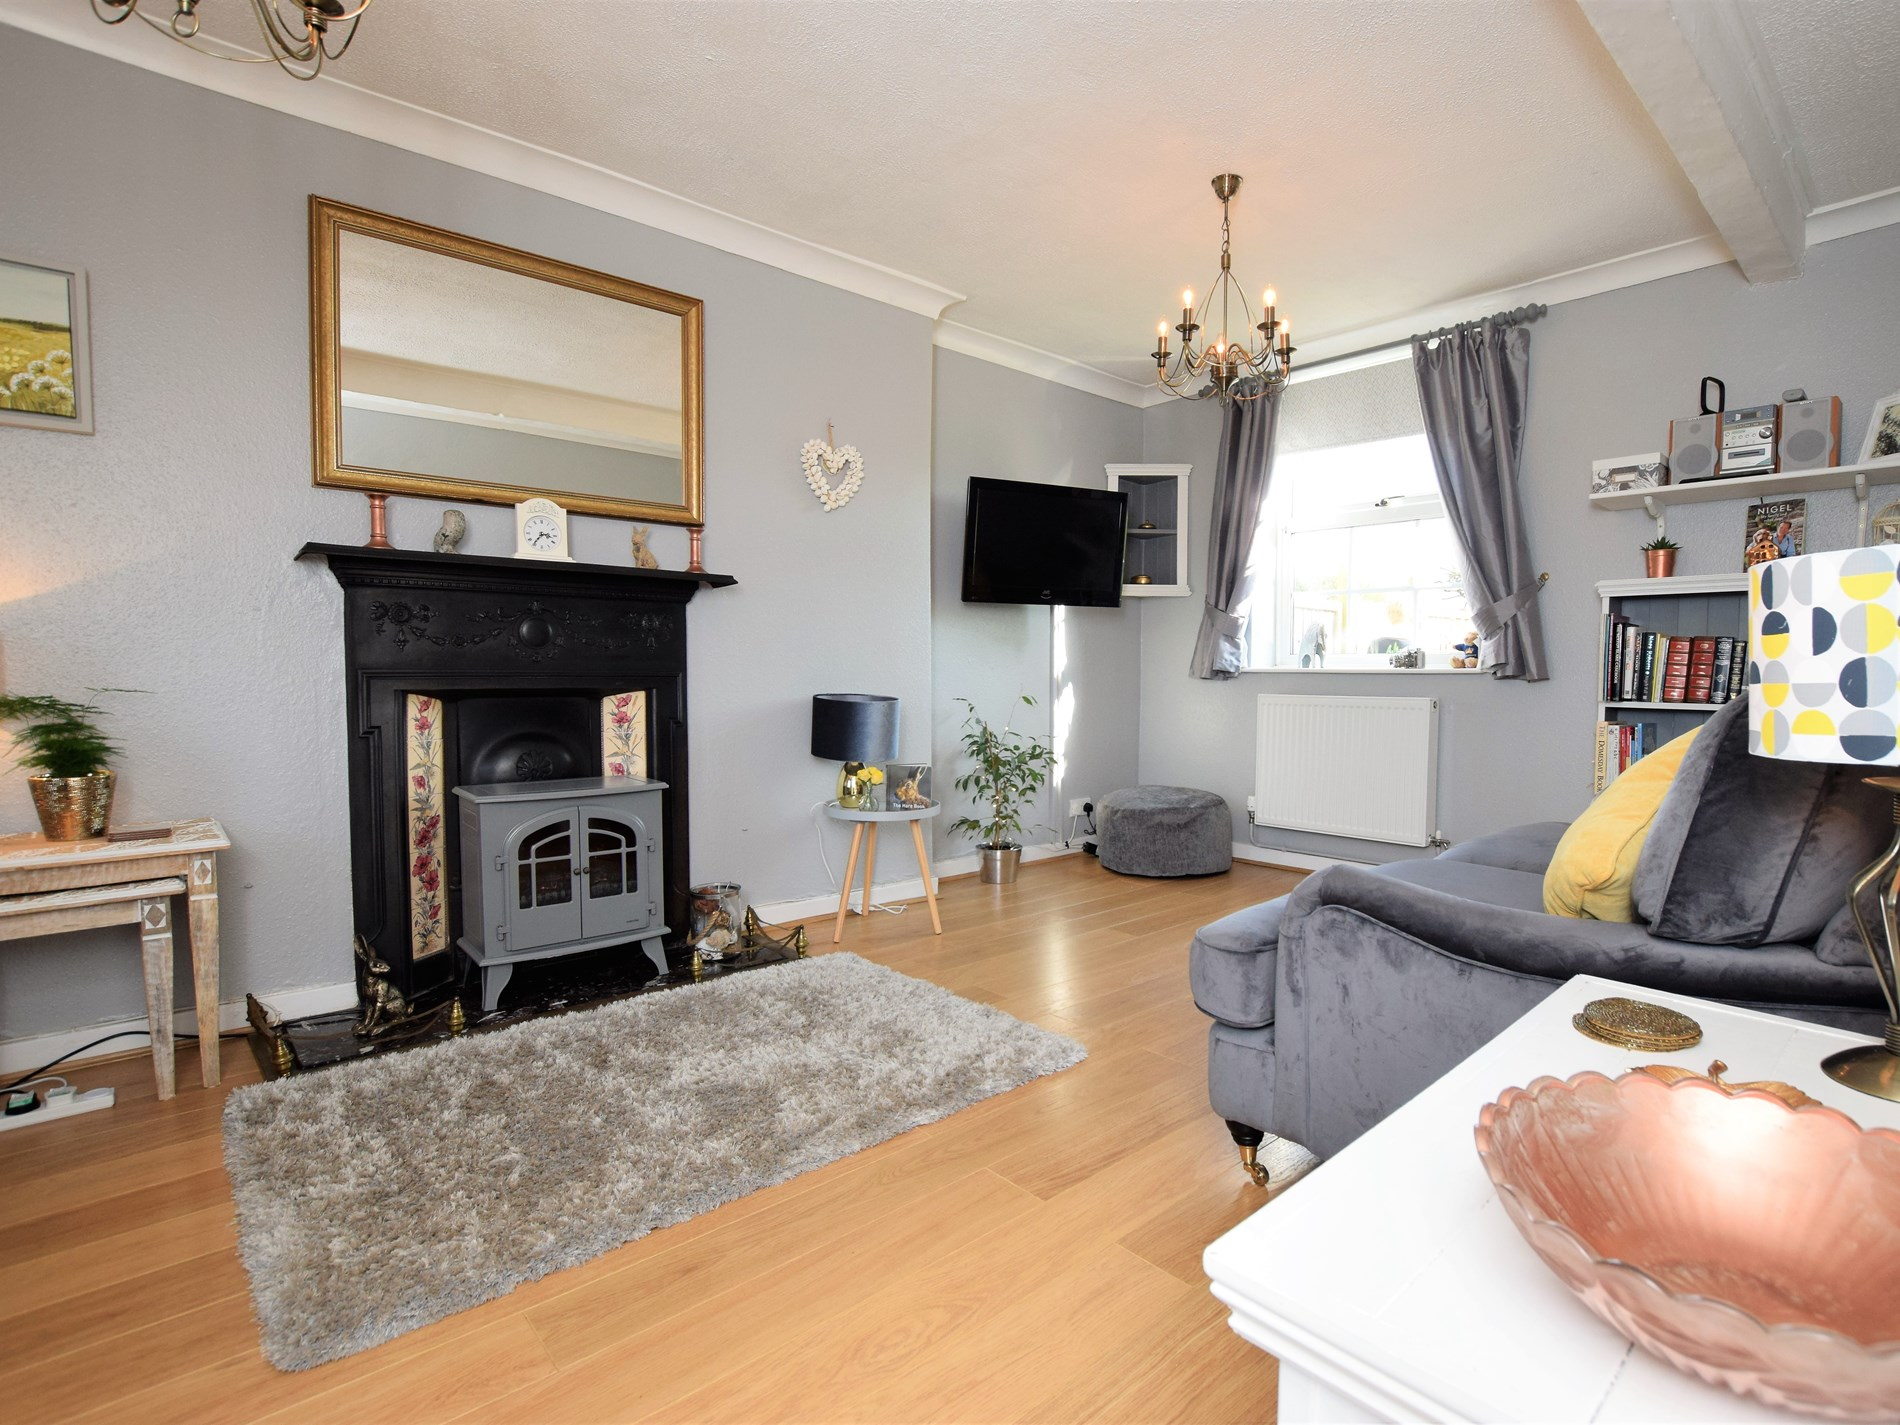 3 Bedroom House in Norfolk, East Anglia